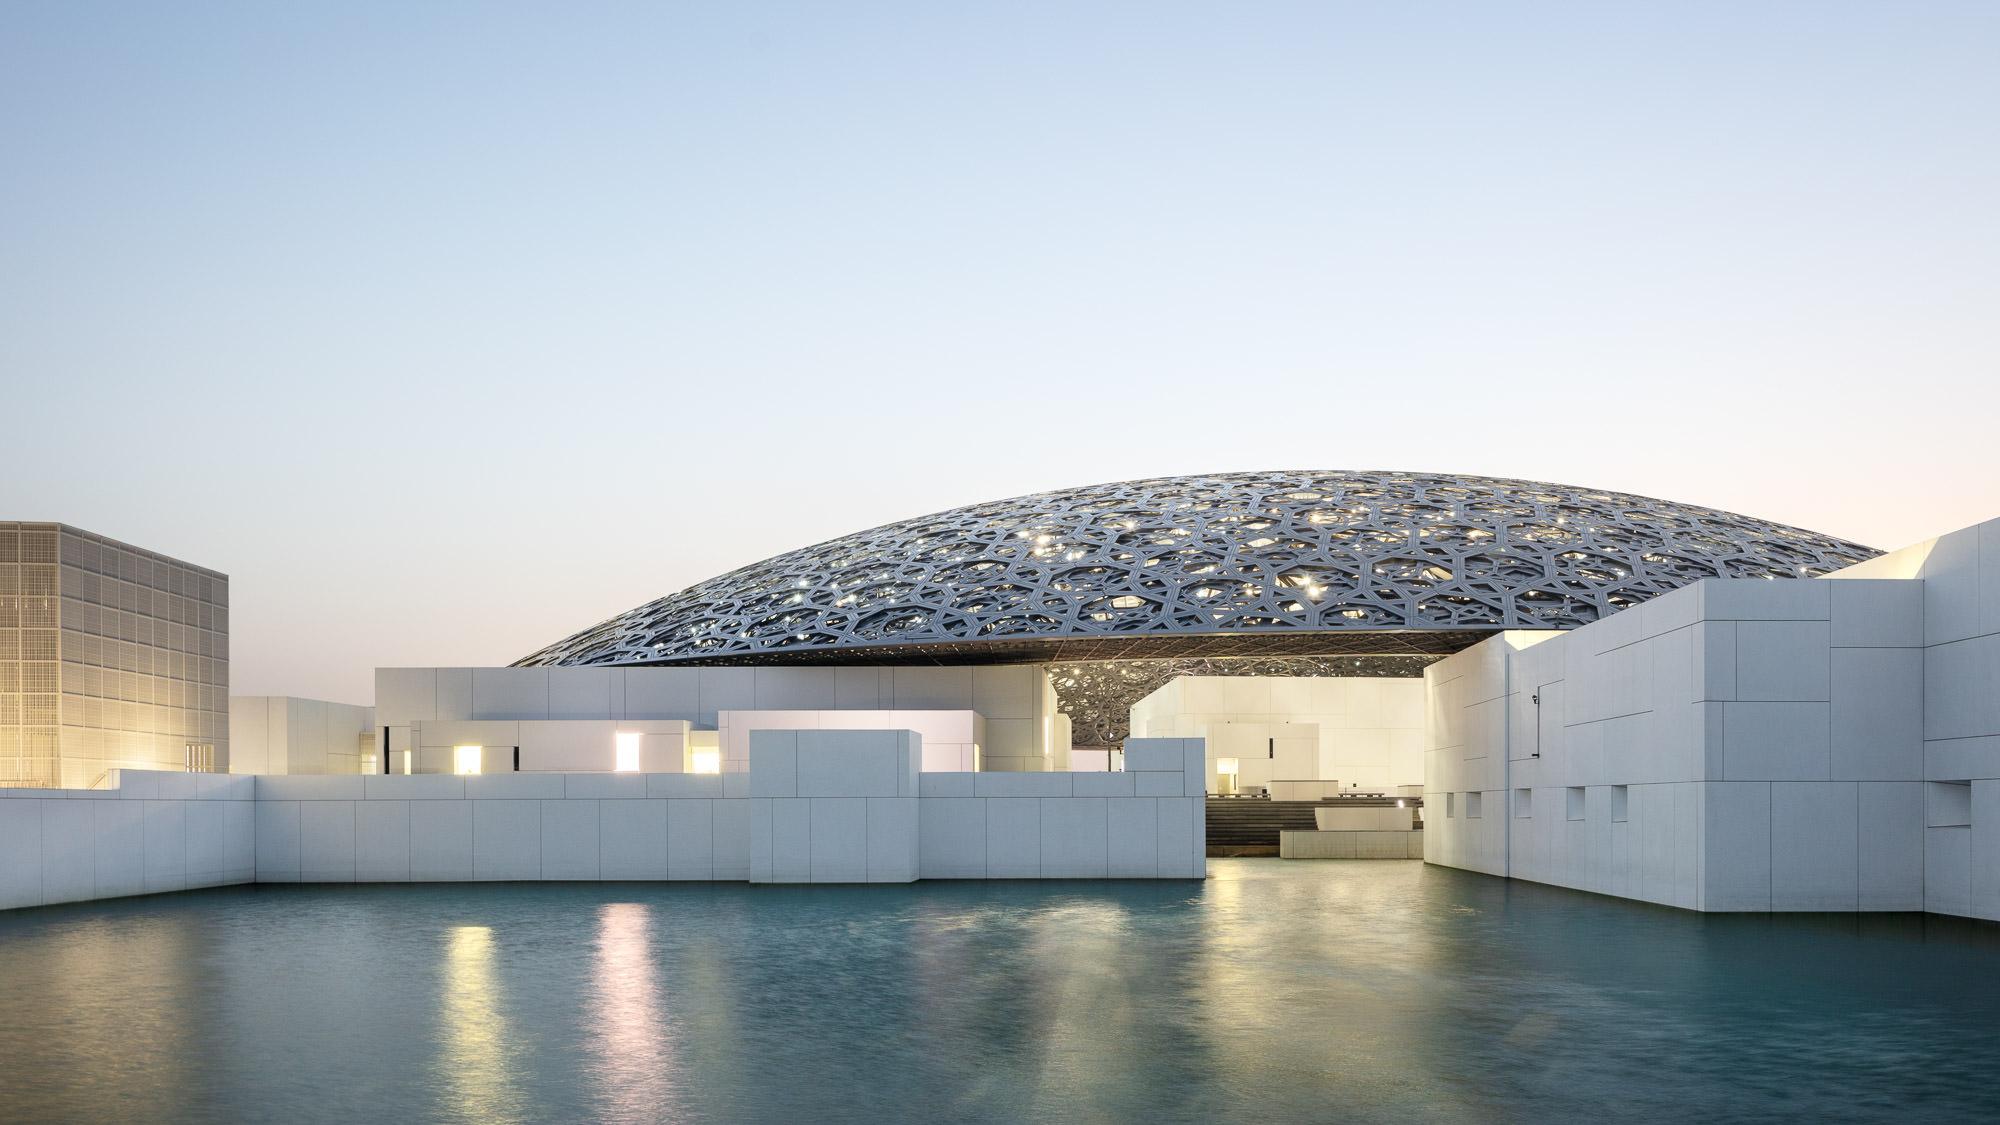 Louvre Abu Dhabi, Abu Dhabi, UAE - Ateliers Jean Nouvel